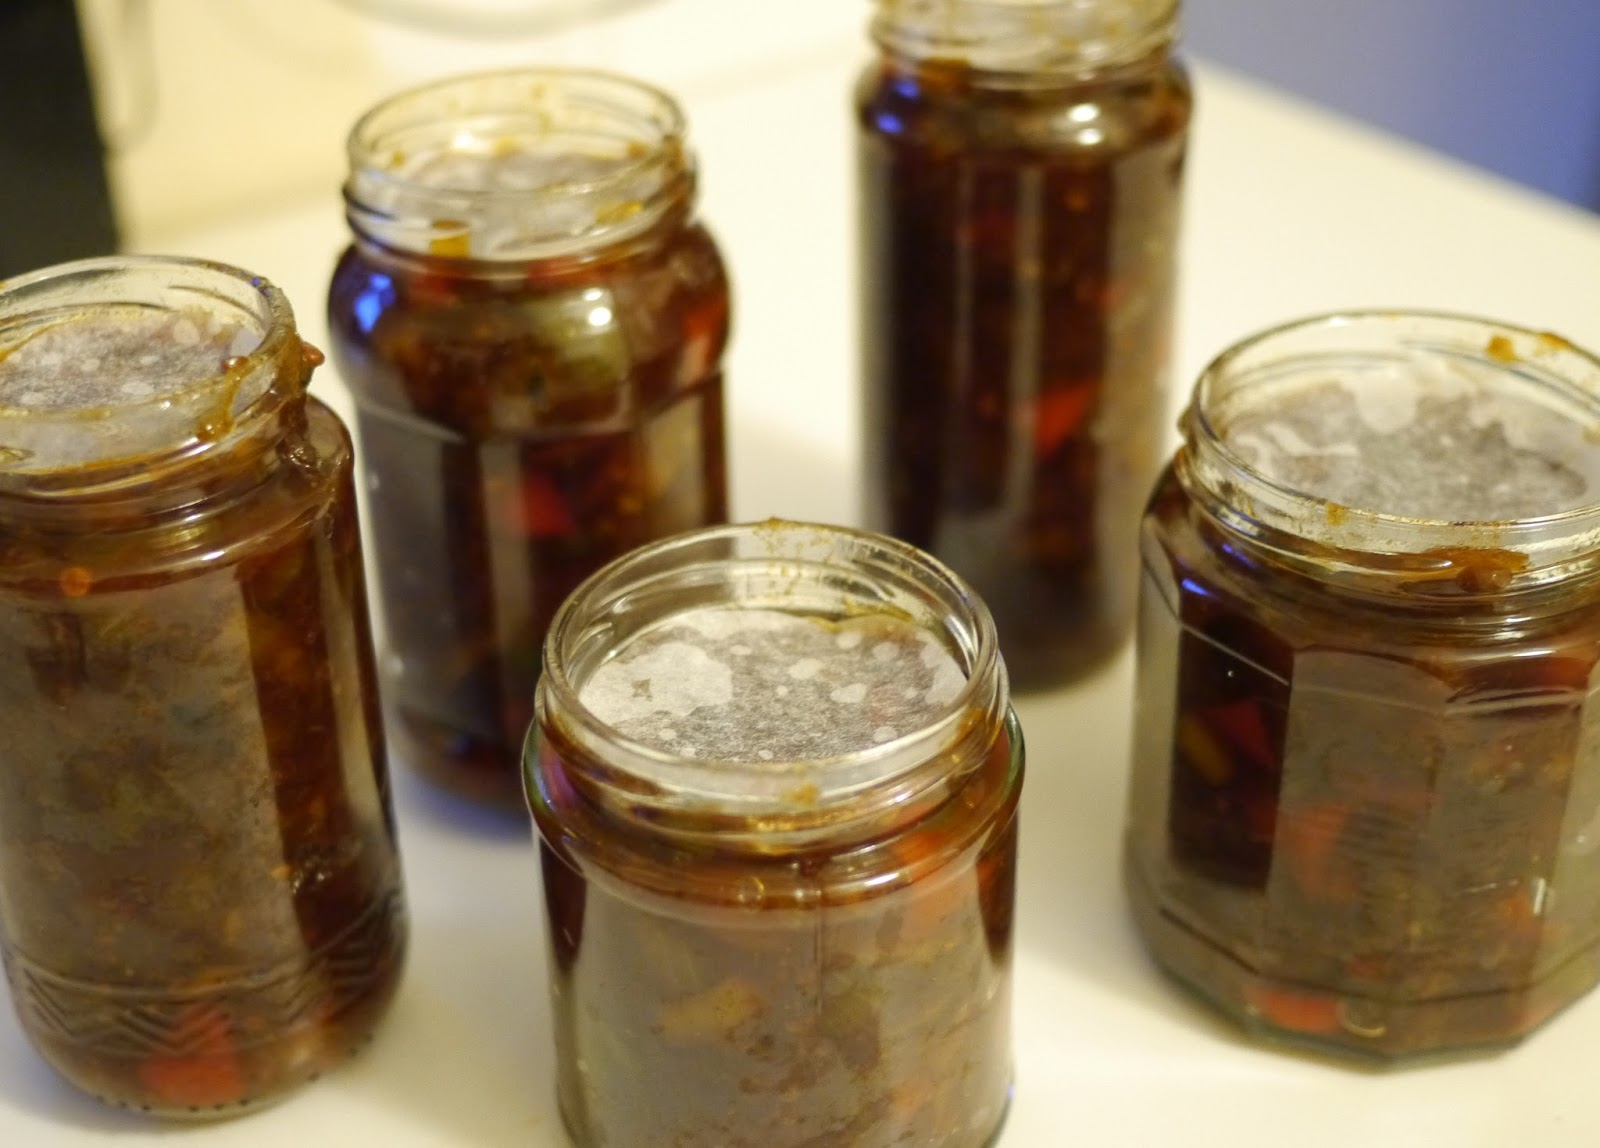 Homemade Christmas Chutney in Jars